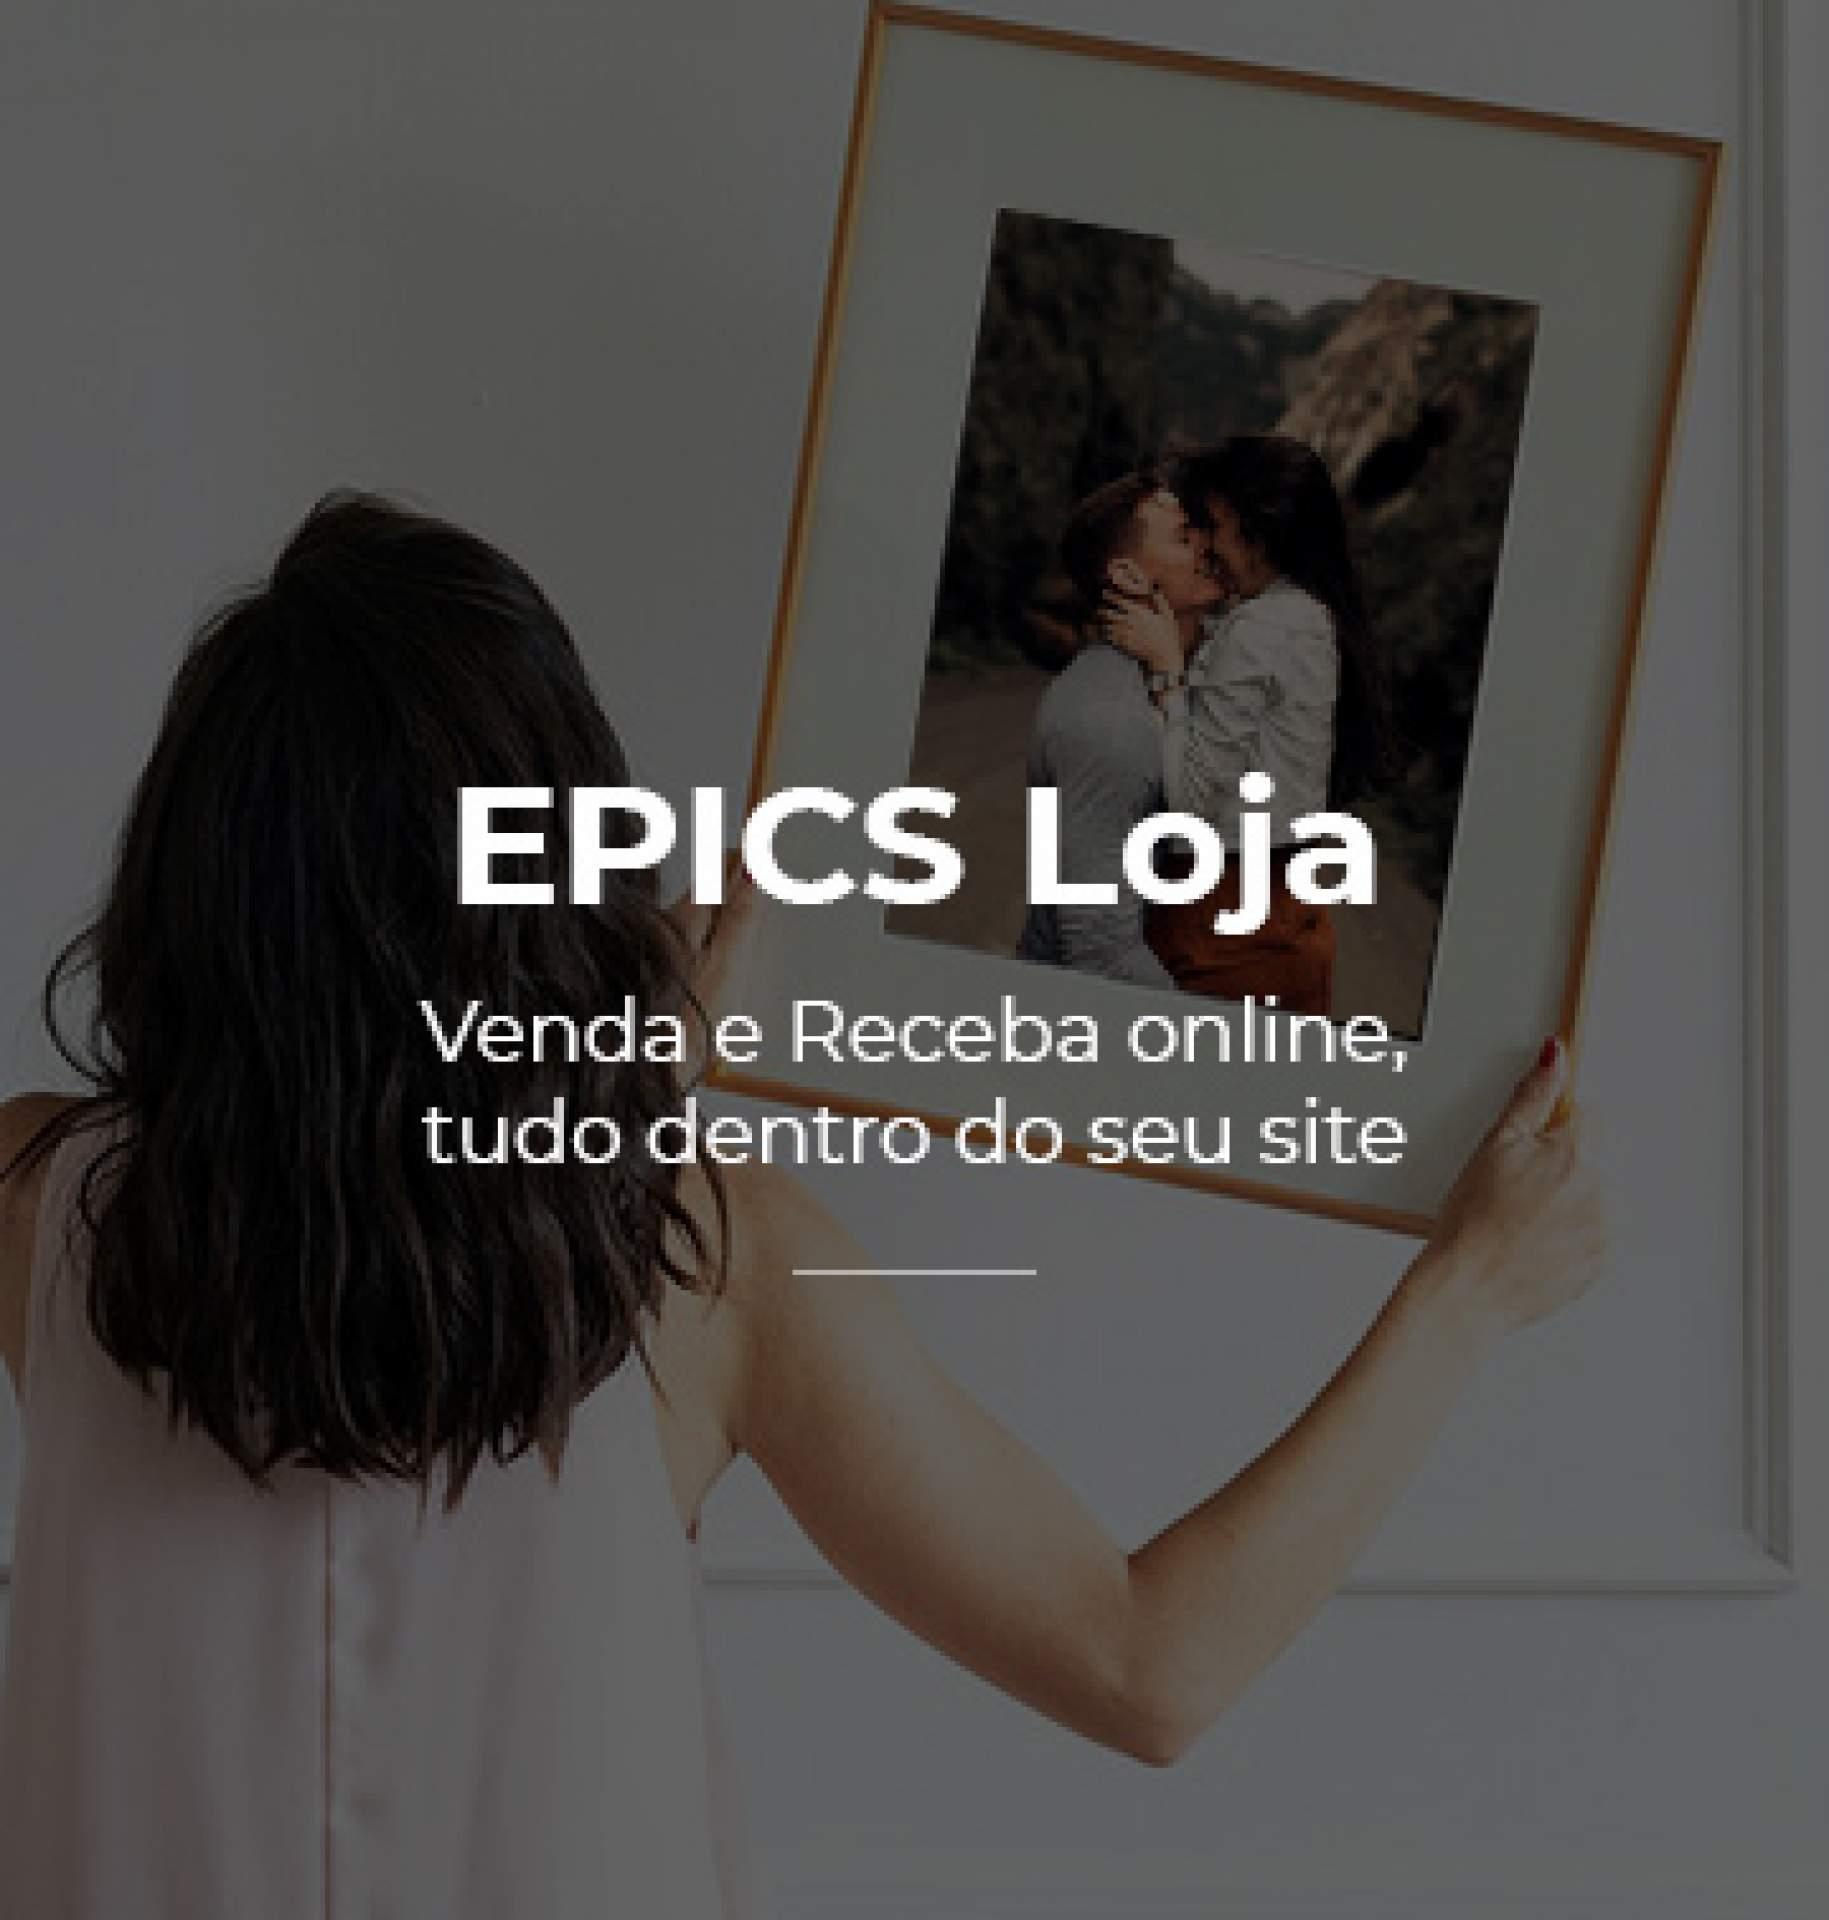 loja epics